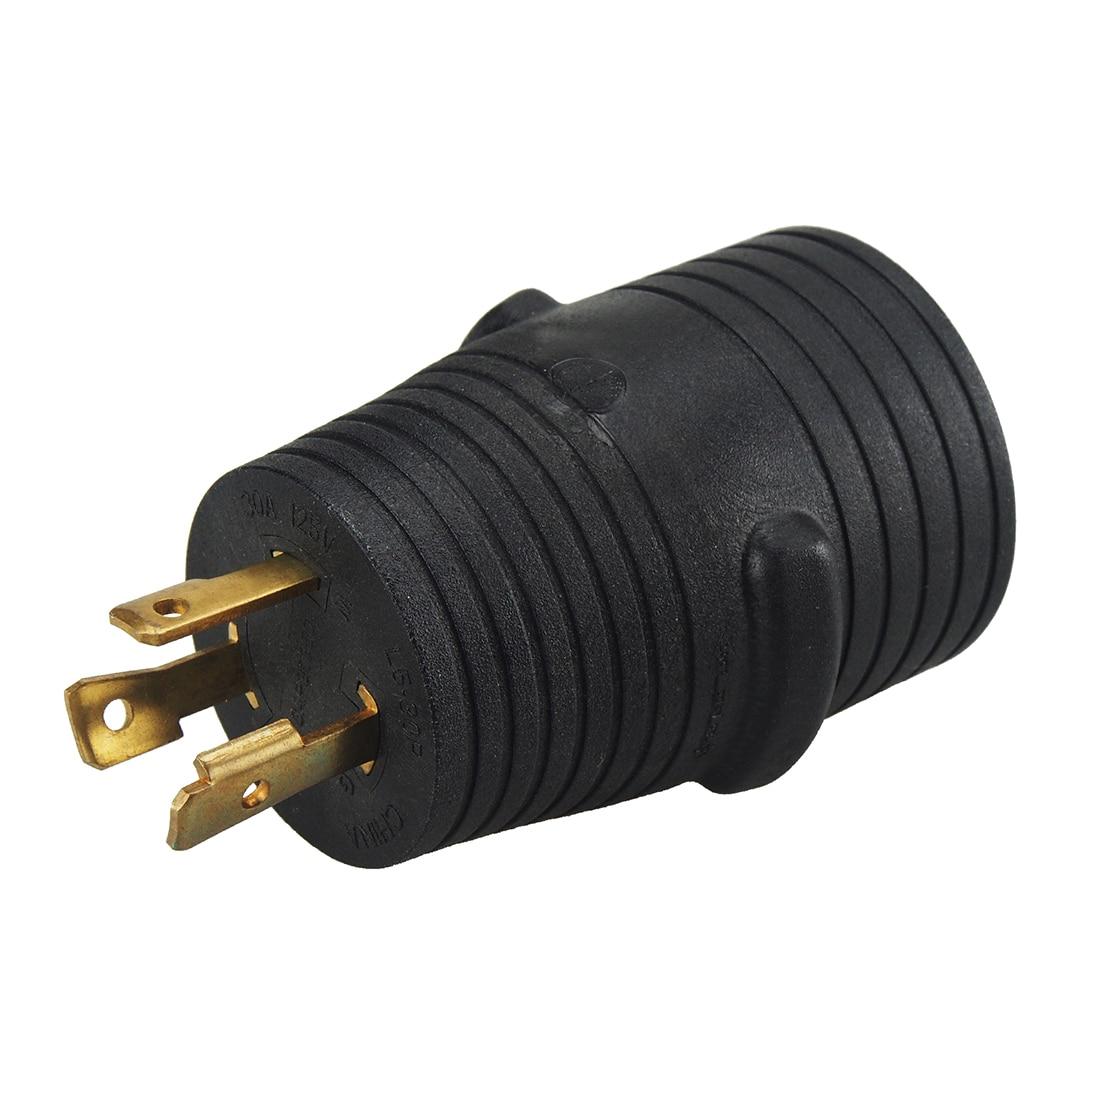 JORINDO [L5-30P до 14-50R] Plugrand Nema L5-30 30 штекер до 14-50 50 Ампер адаптер генератора, Nema L5-30P до 14-50R - Цвет: Черный